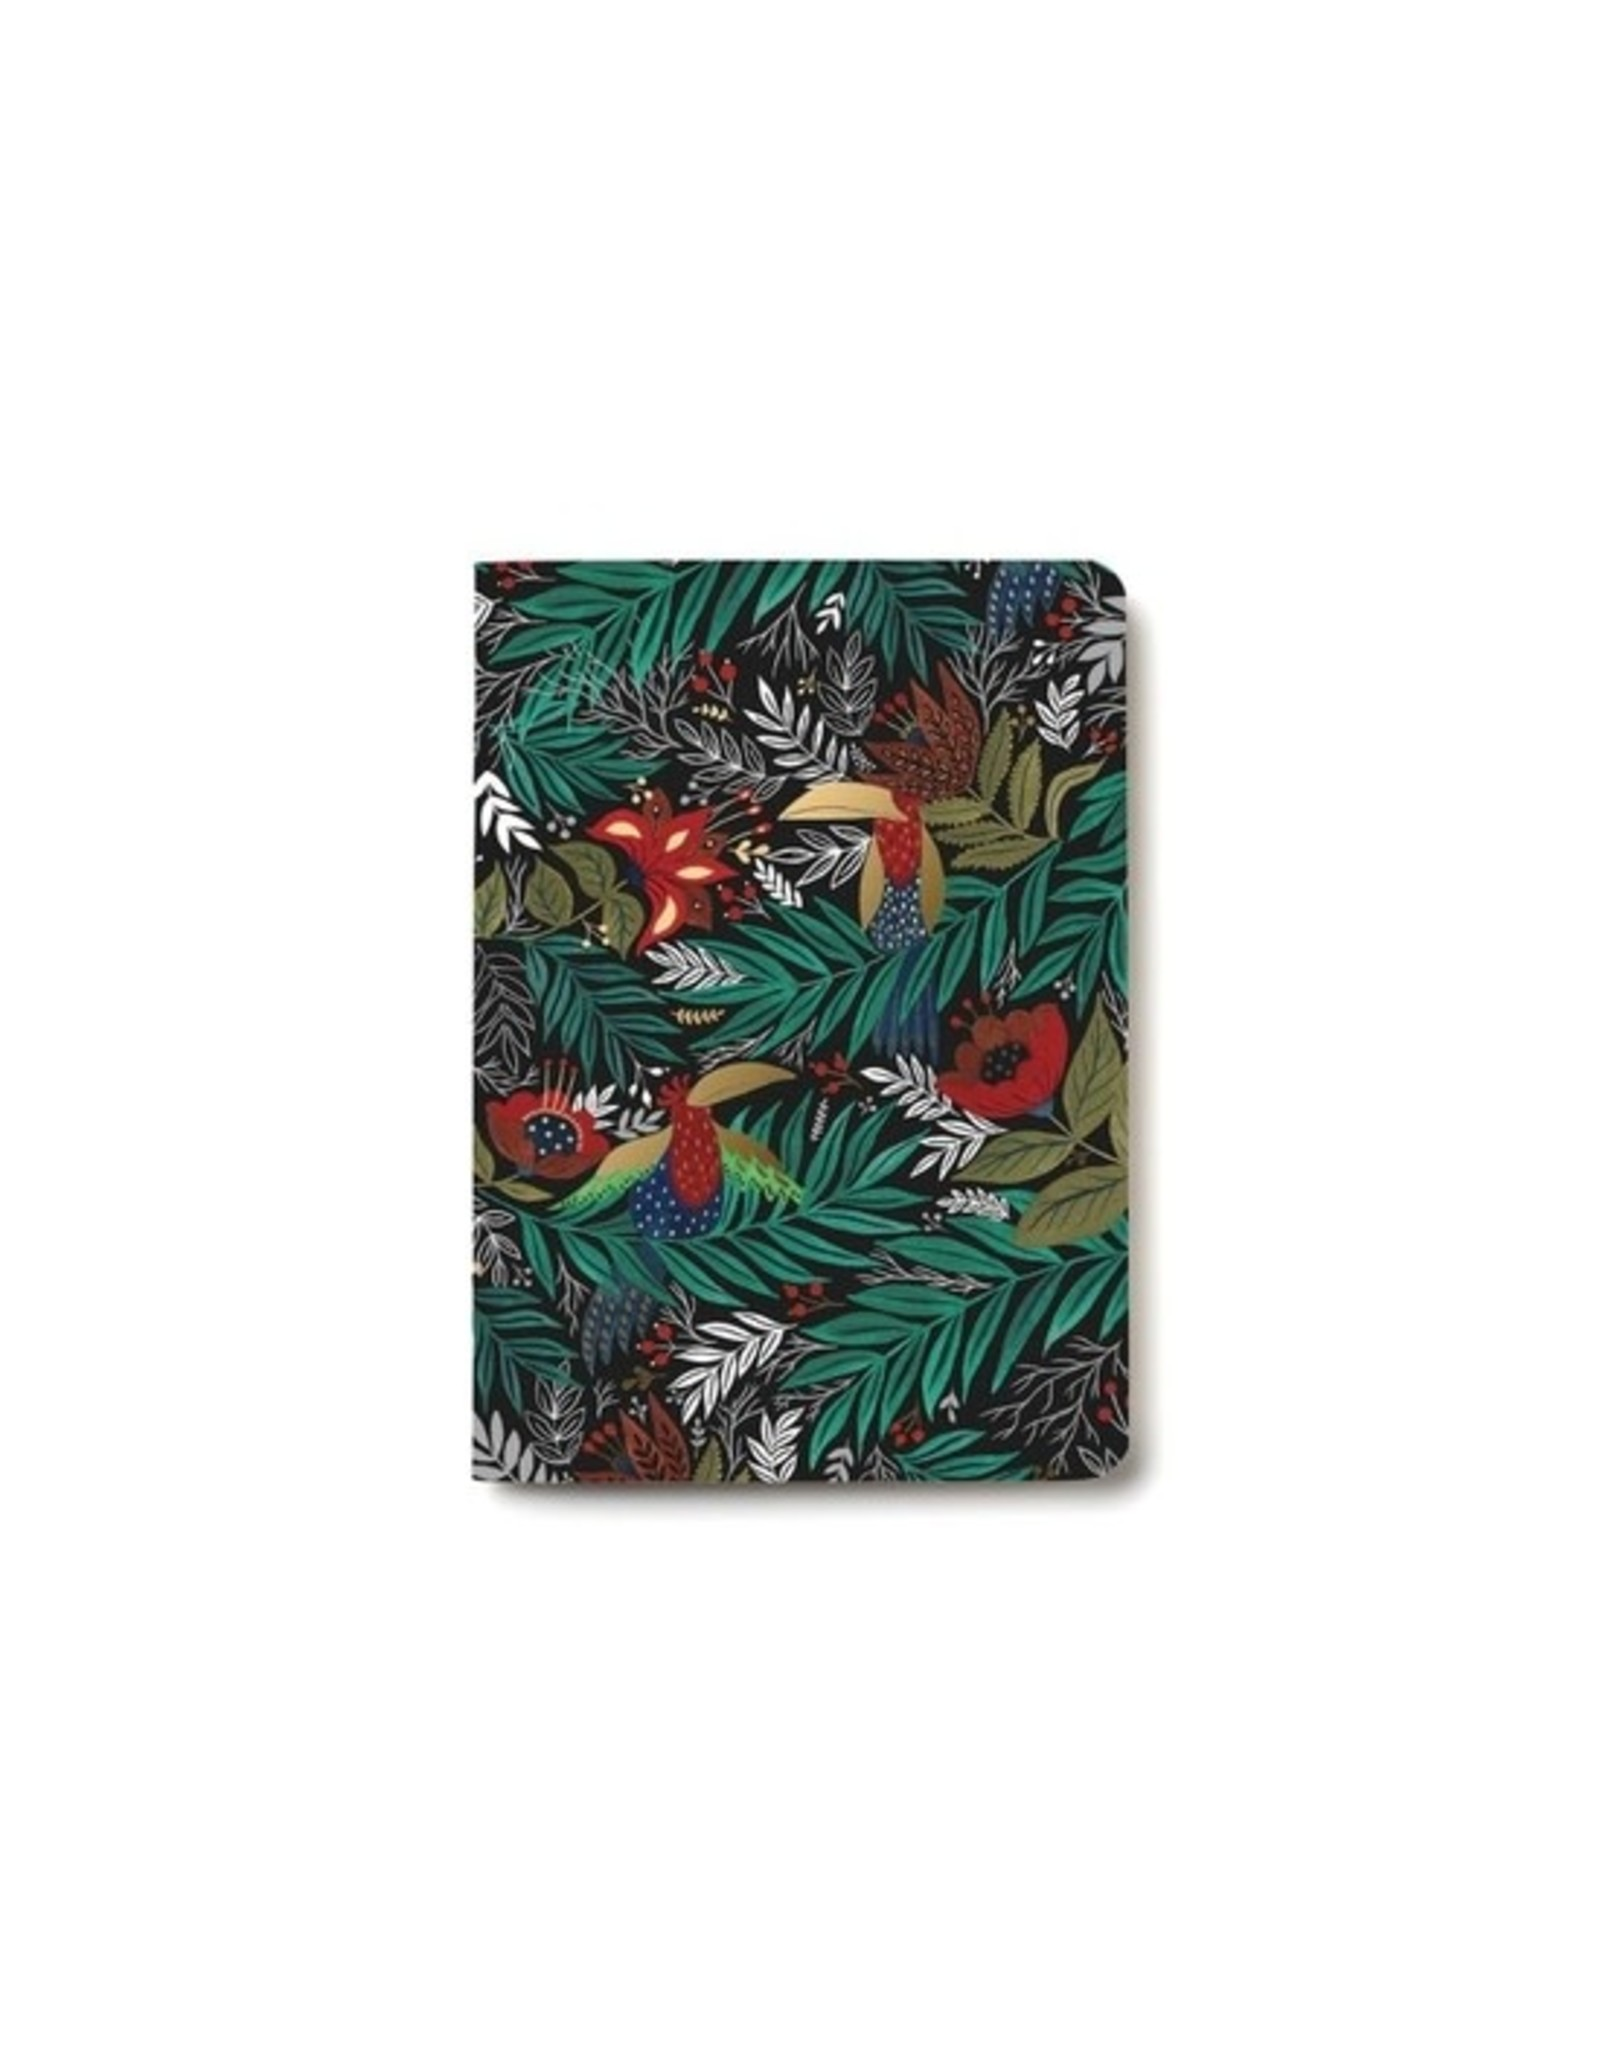 Parrots Notebook